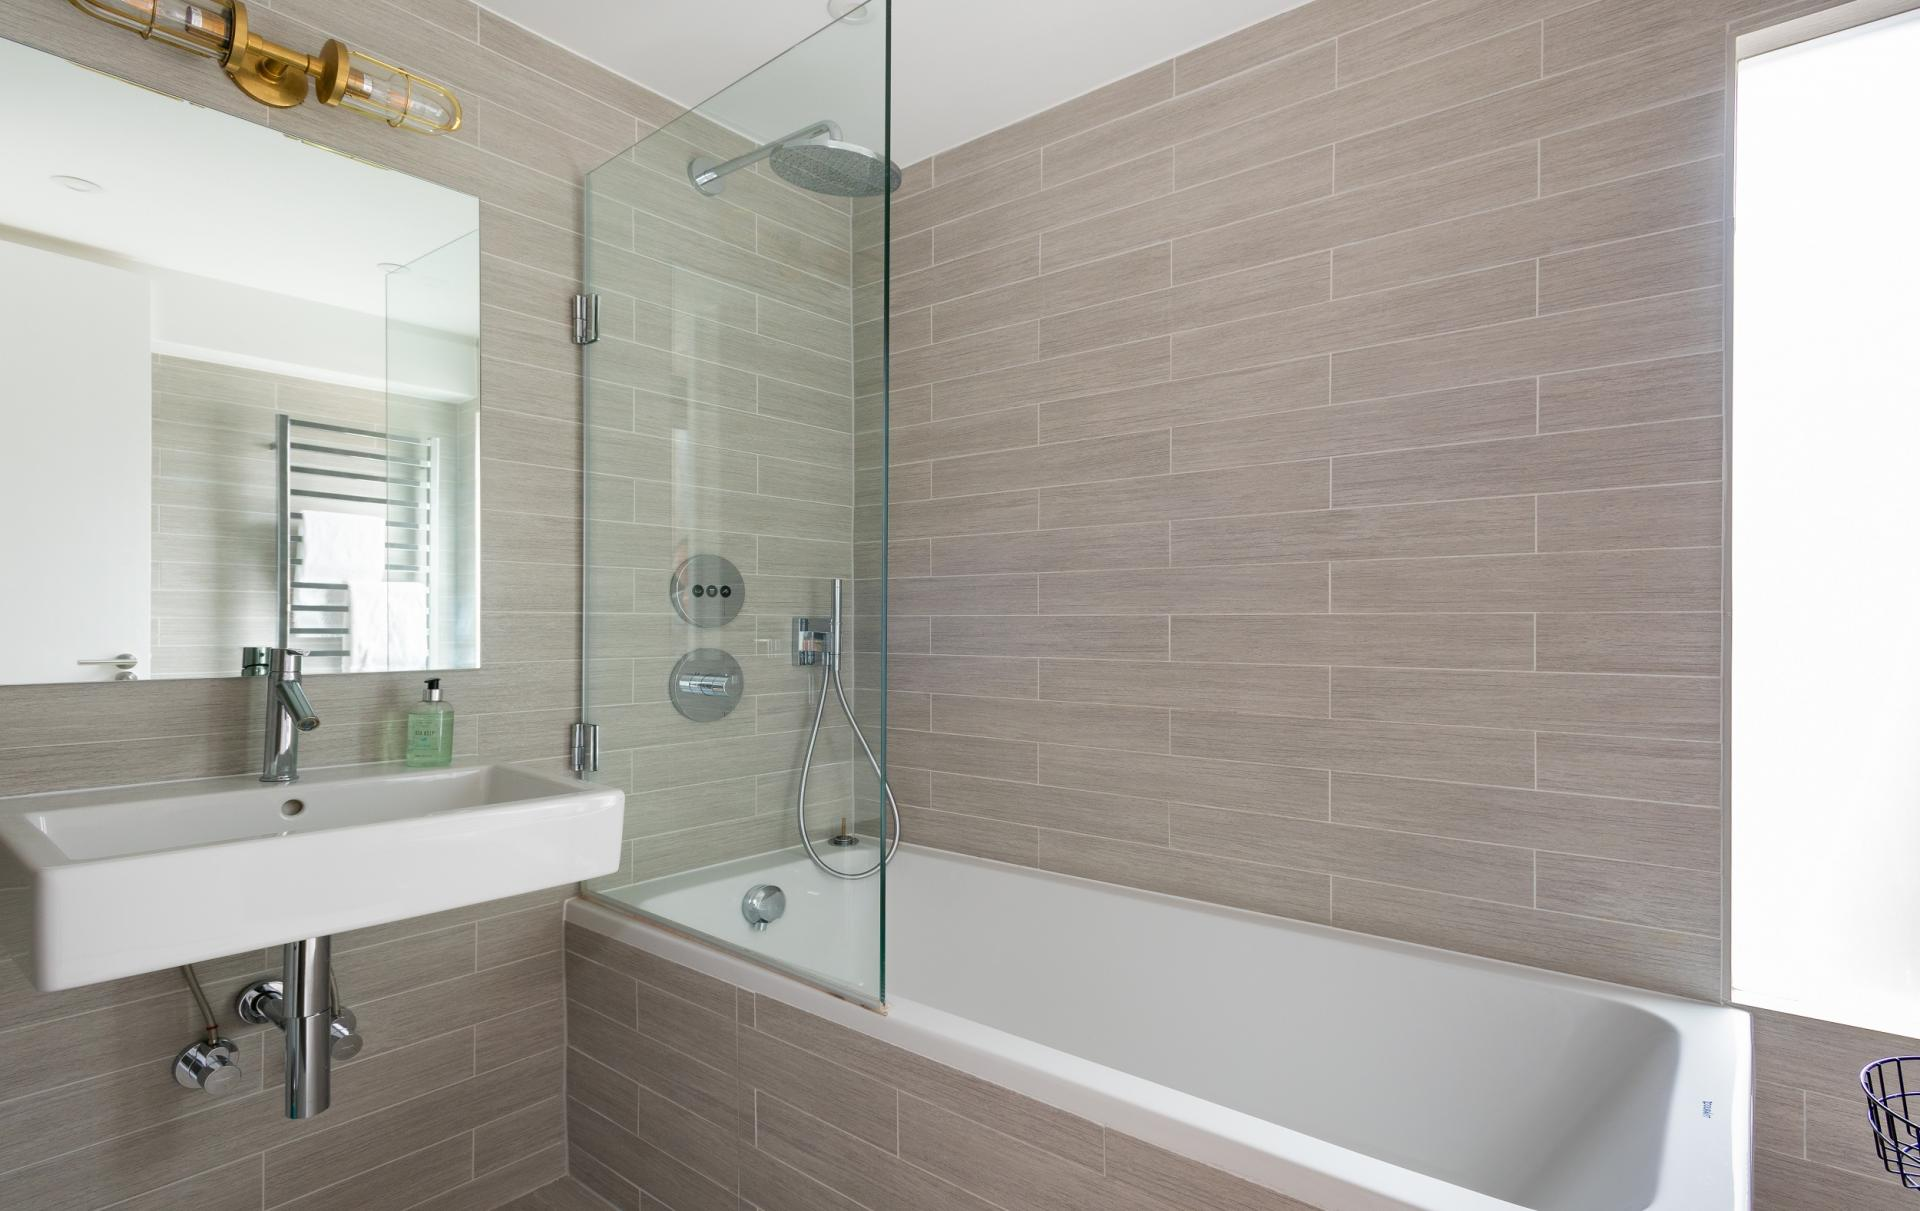 Bathroom at The Oxford Gardens, White City, London - Citybase Apartments